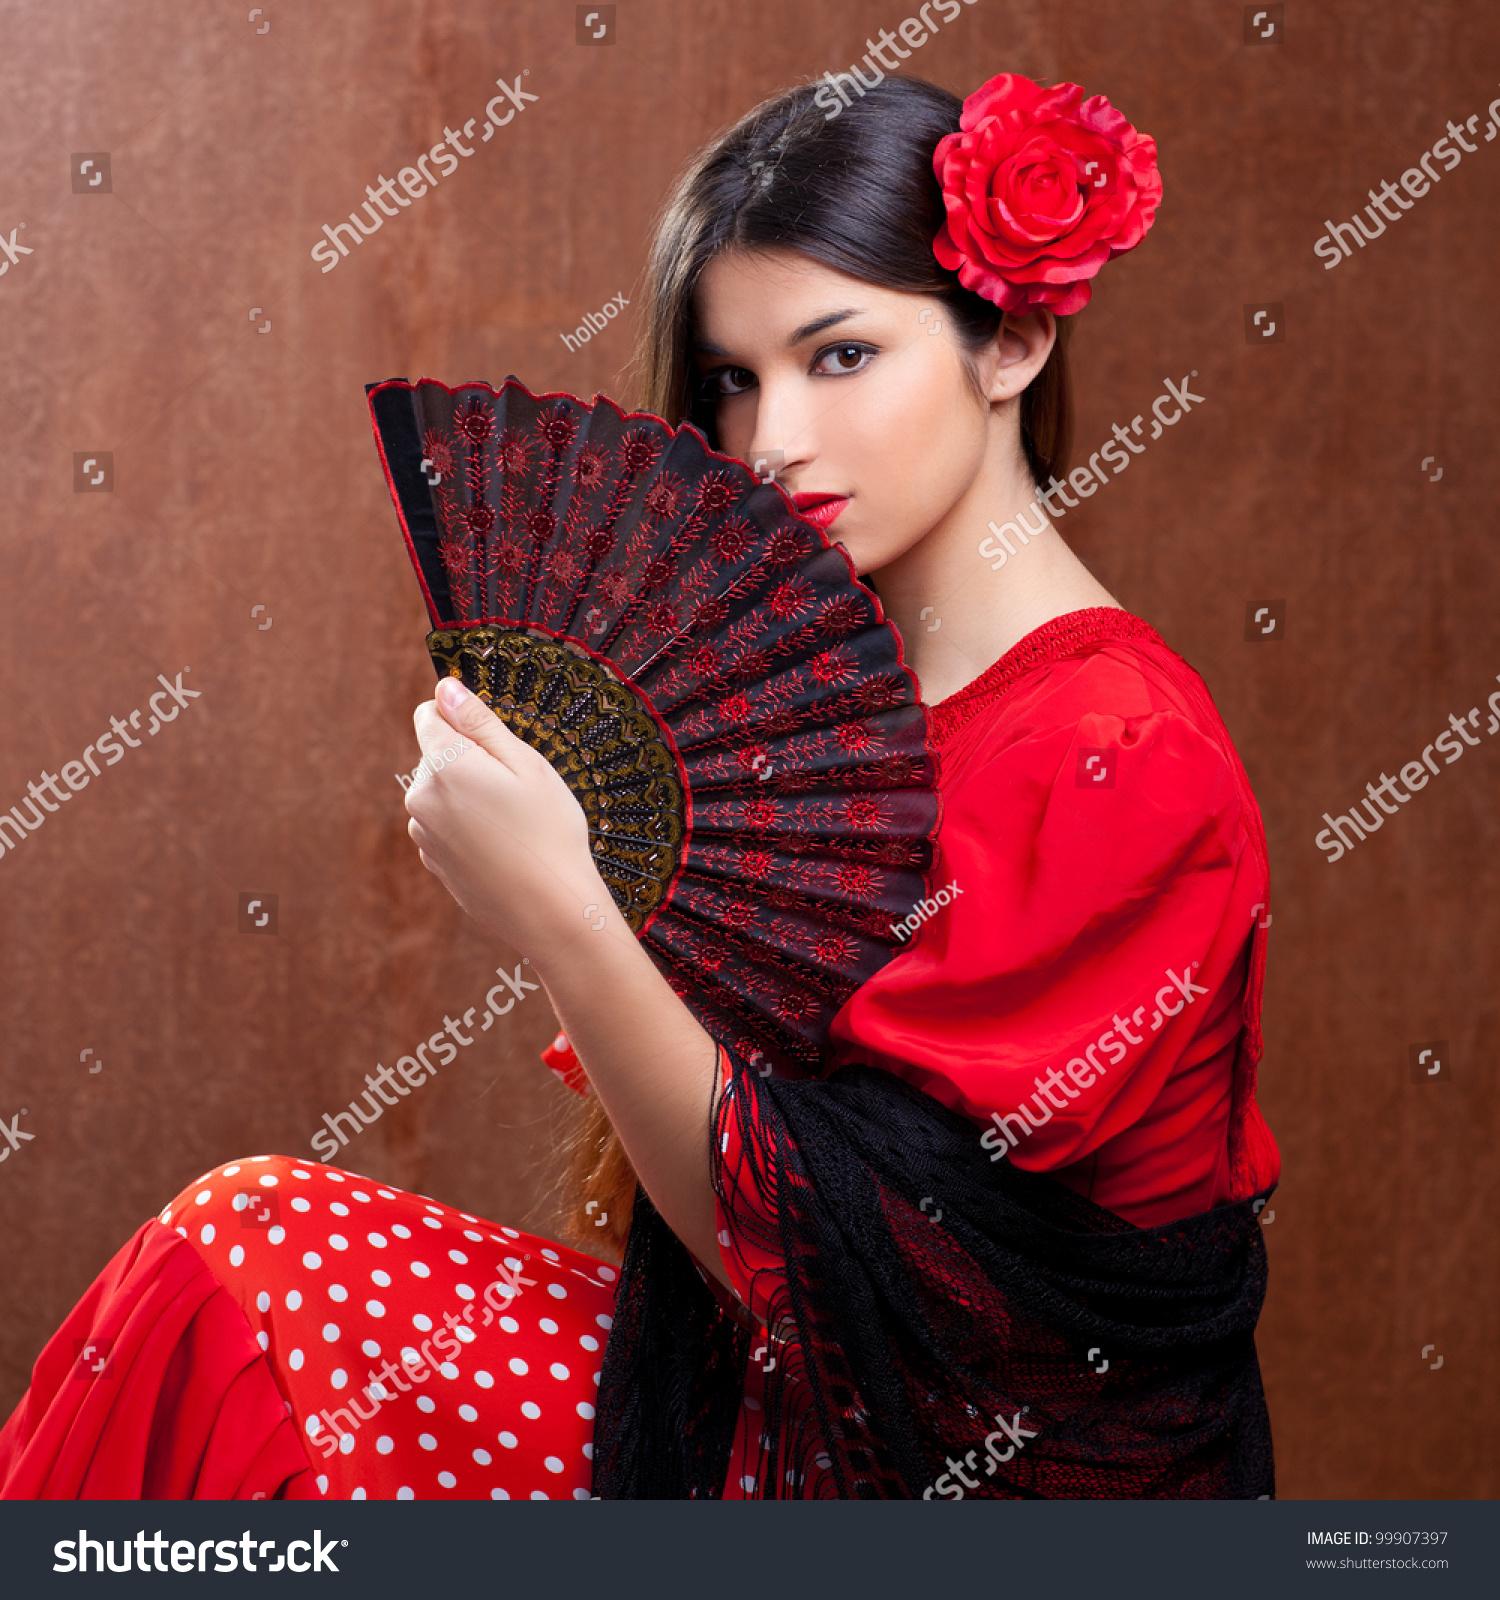 flamenco dancer spain woman gypsy red stock photo 99907397